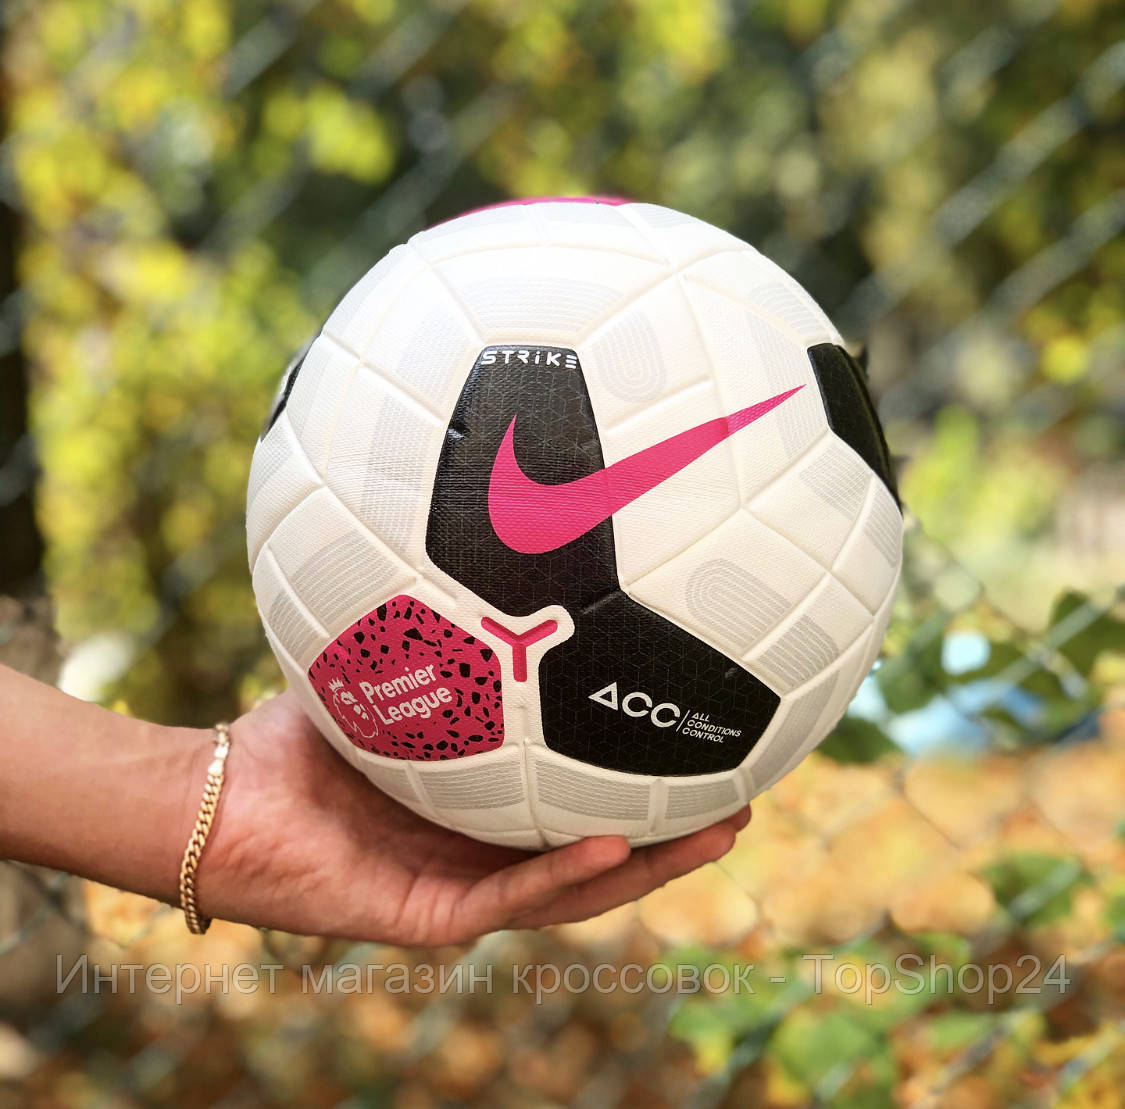 Футбольный мяч Nike merlin Premier League 2019-2020, фото 1